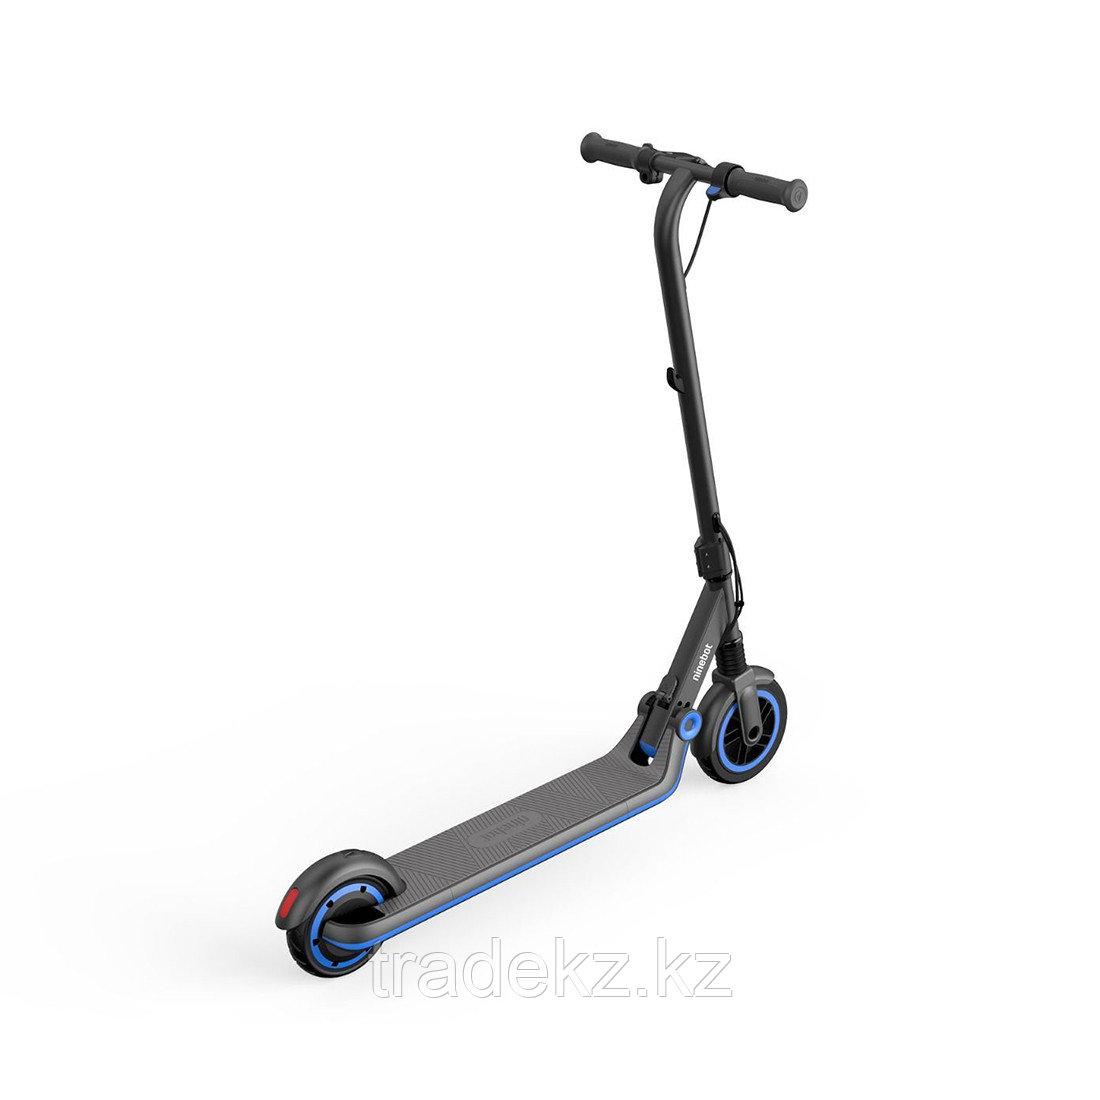 Электросамокат детский Ninebot KickScooter E10 Серый - фото 3